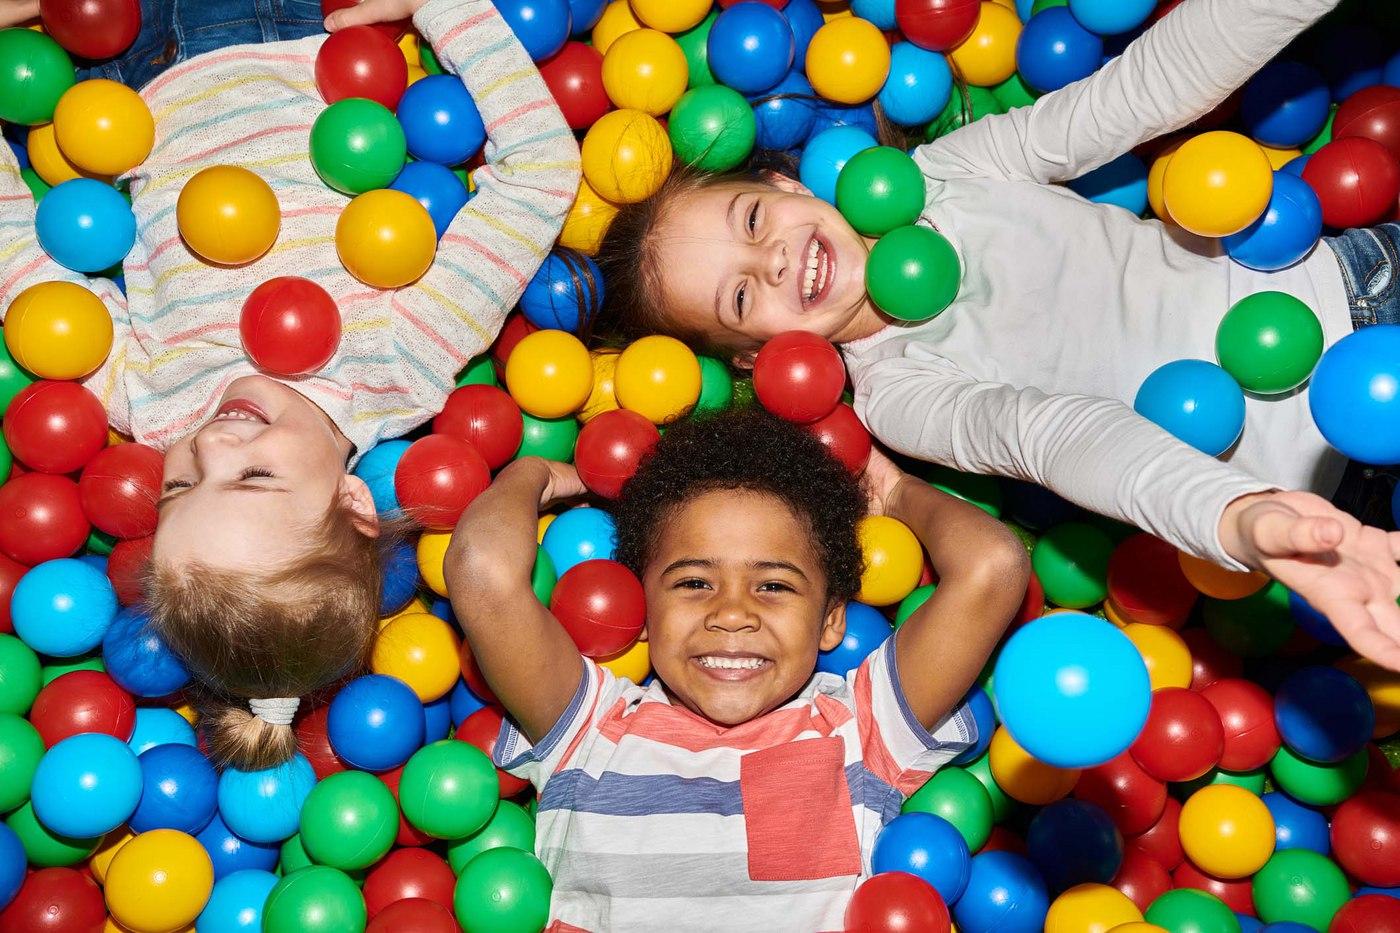 Kids play (istock)